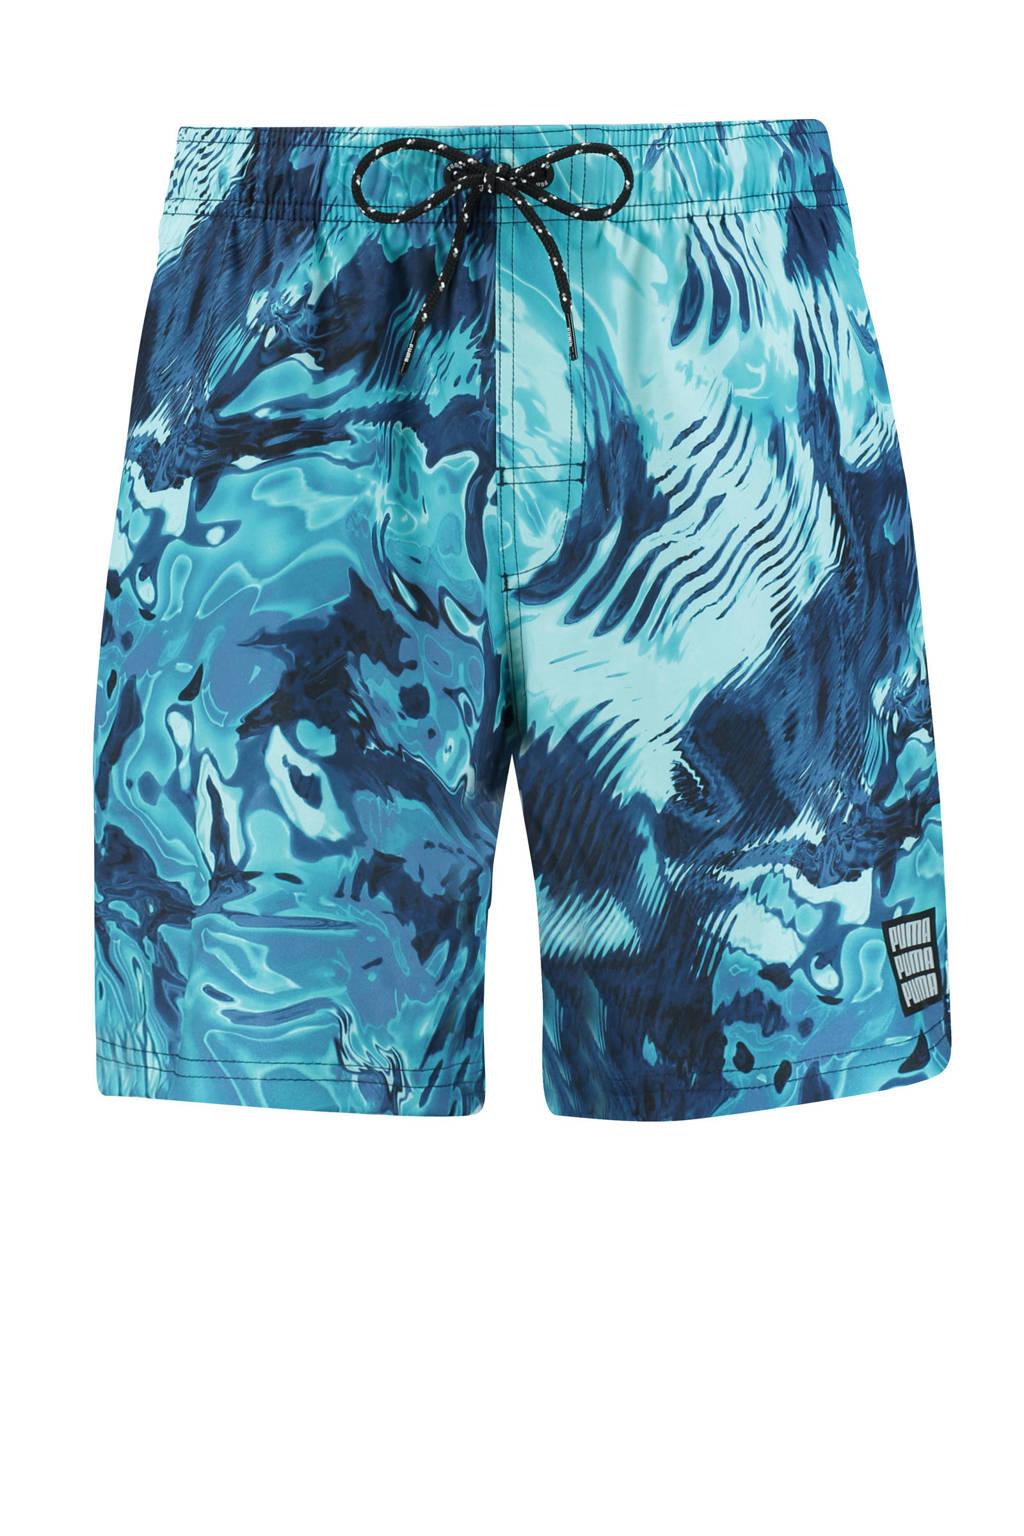 Puma zwemshort met all over print blauw, Blauw